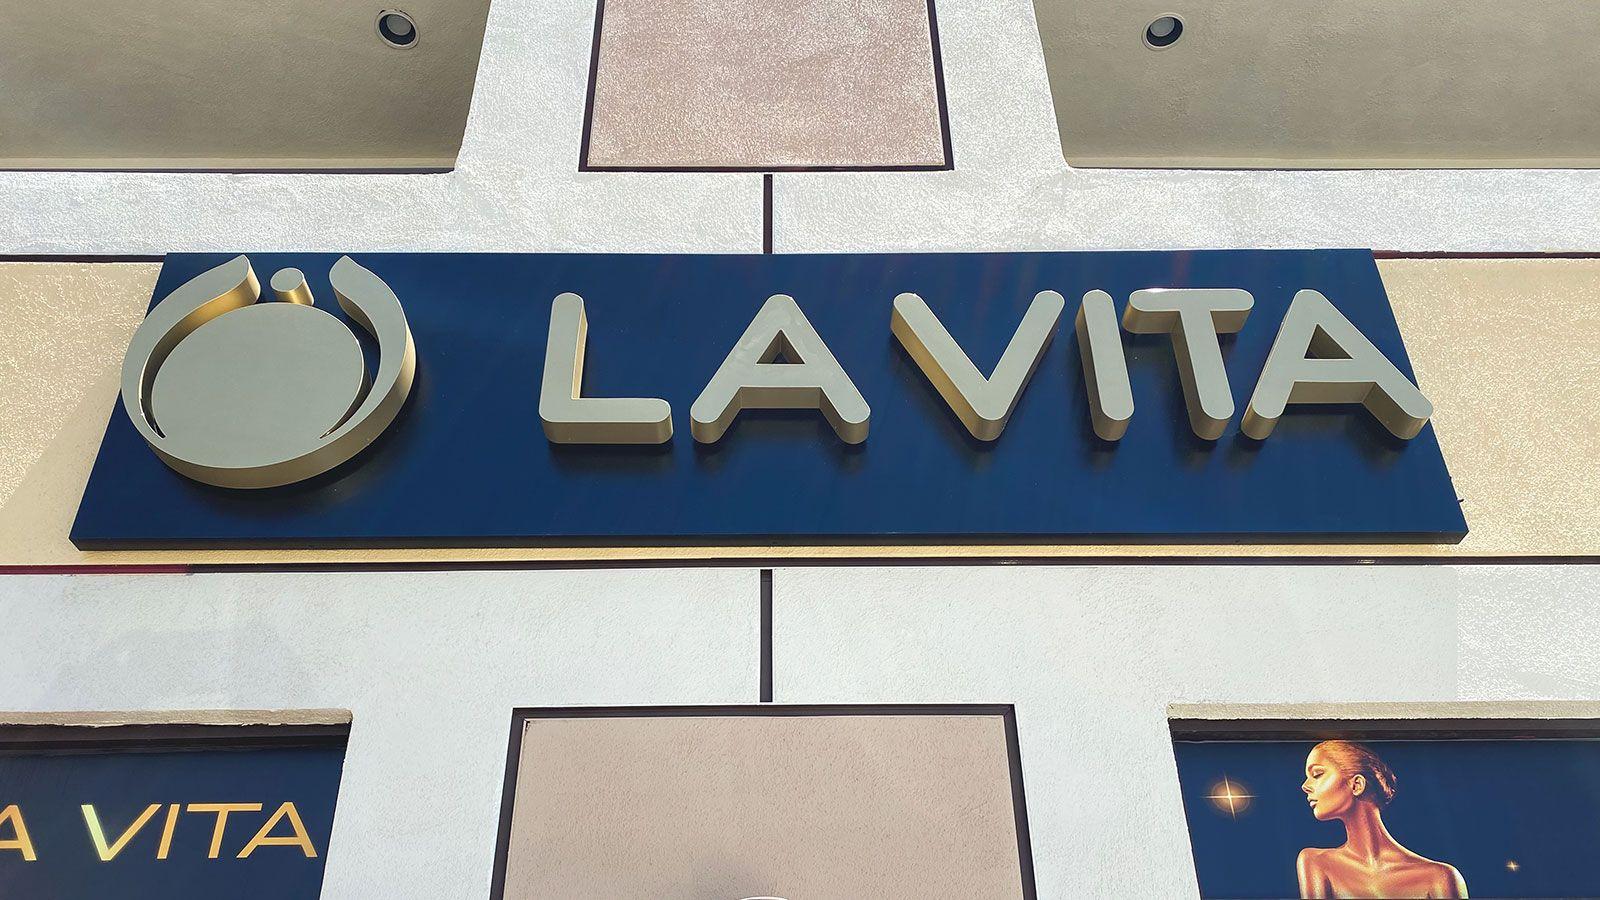 La Vita reverse channel letters